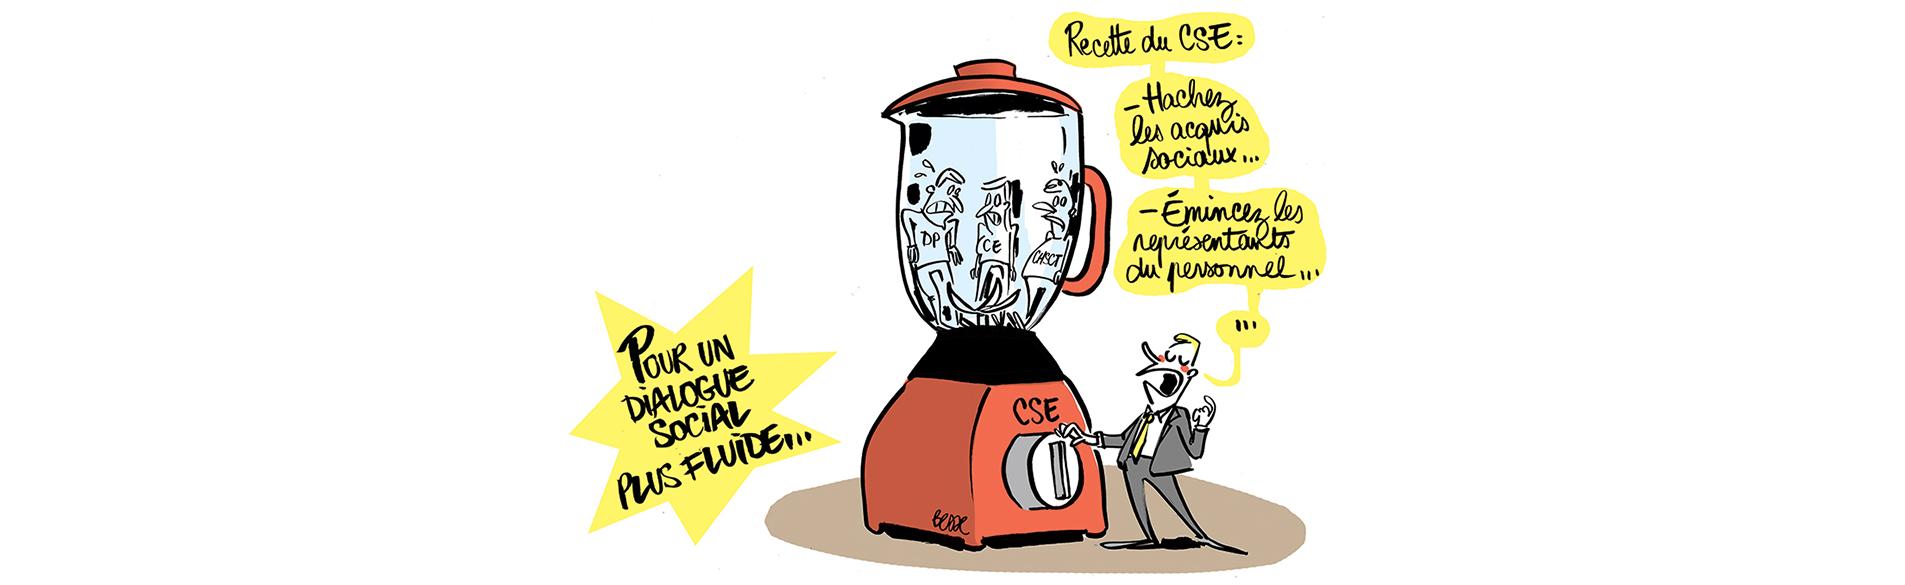 Camille Besse/CCAS